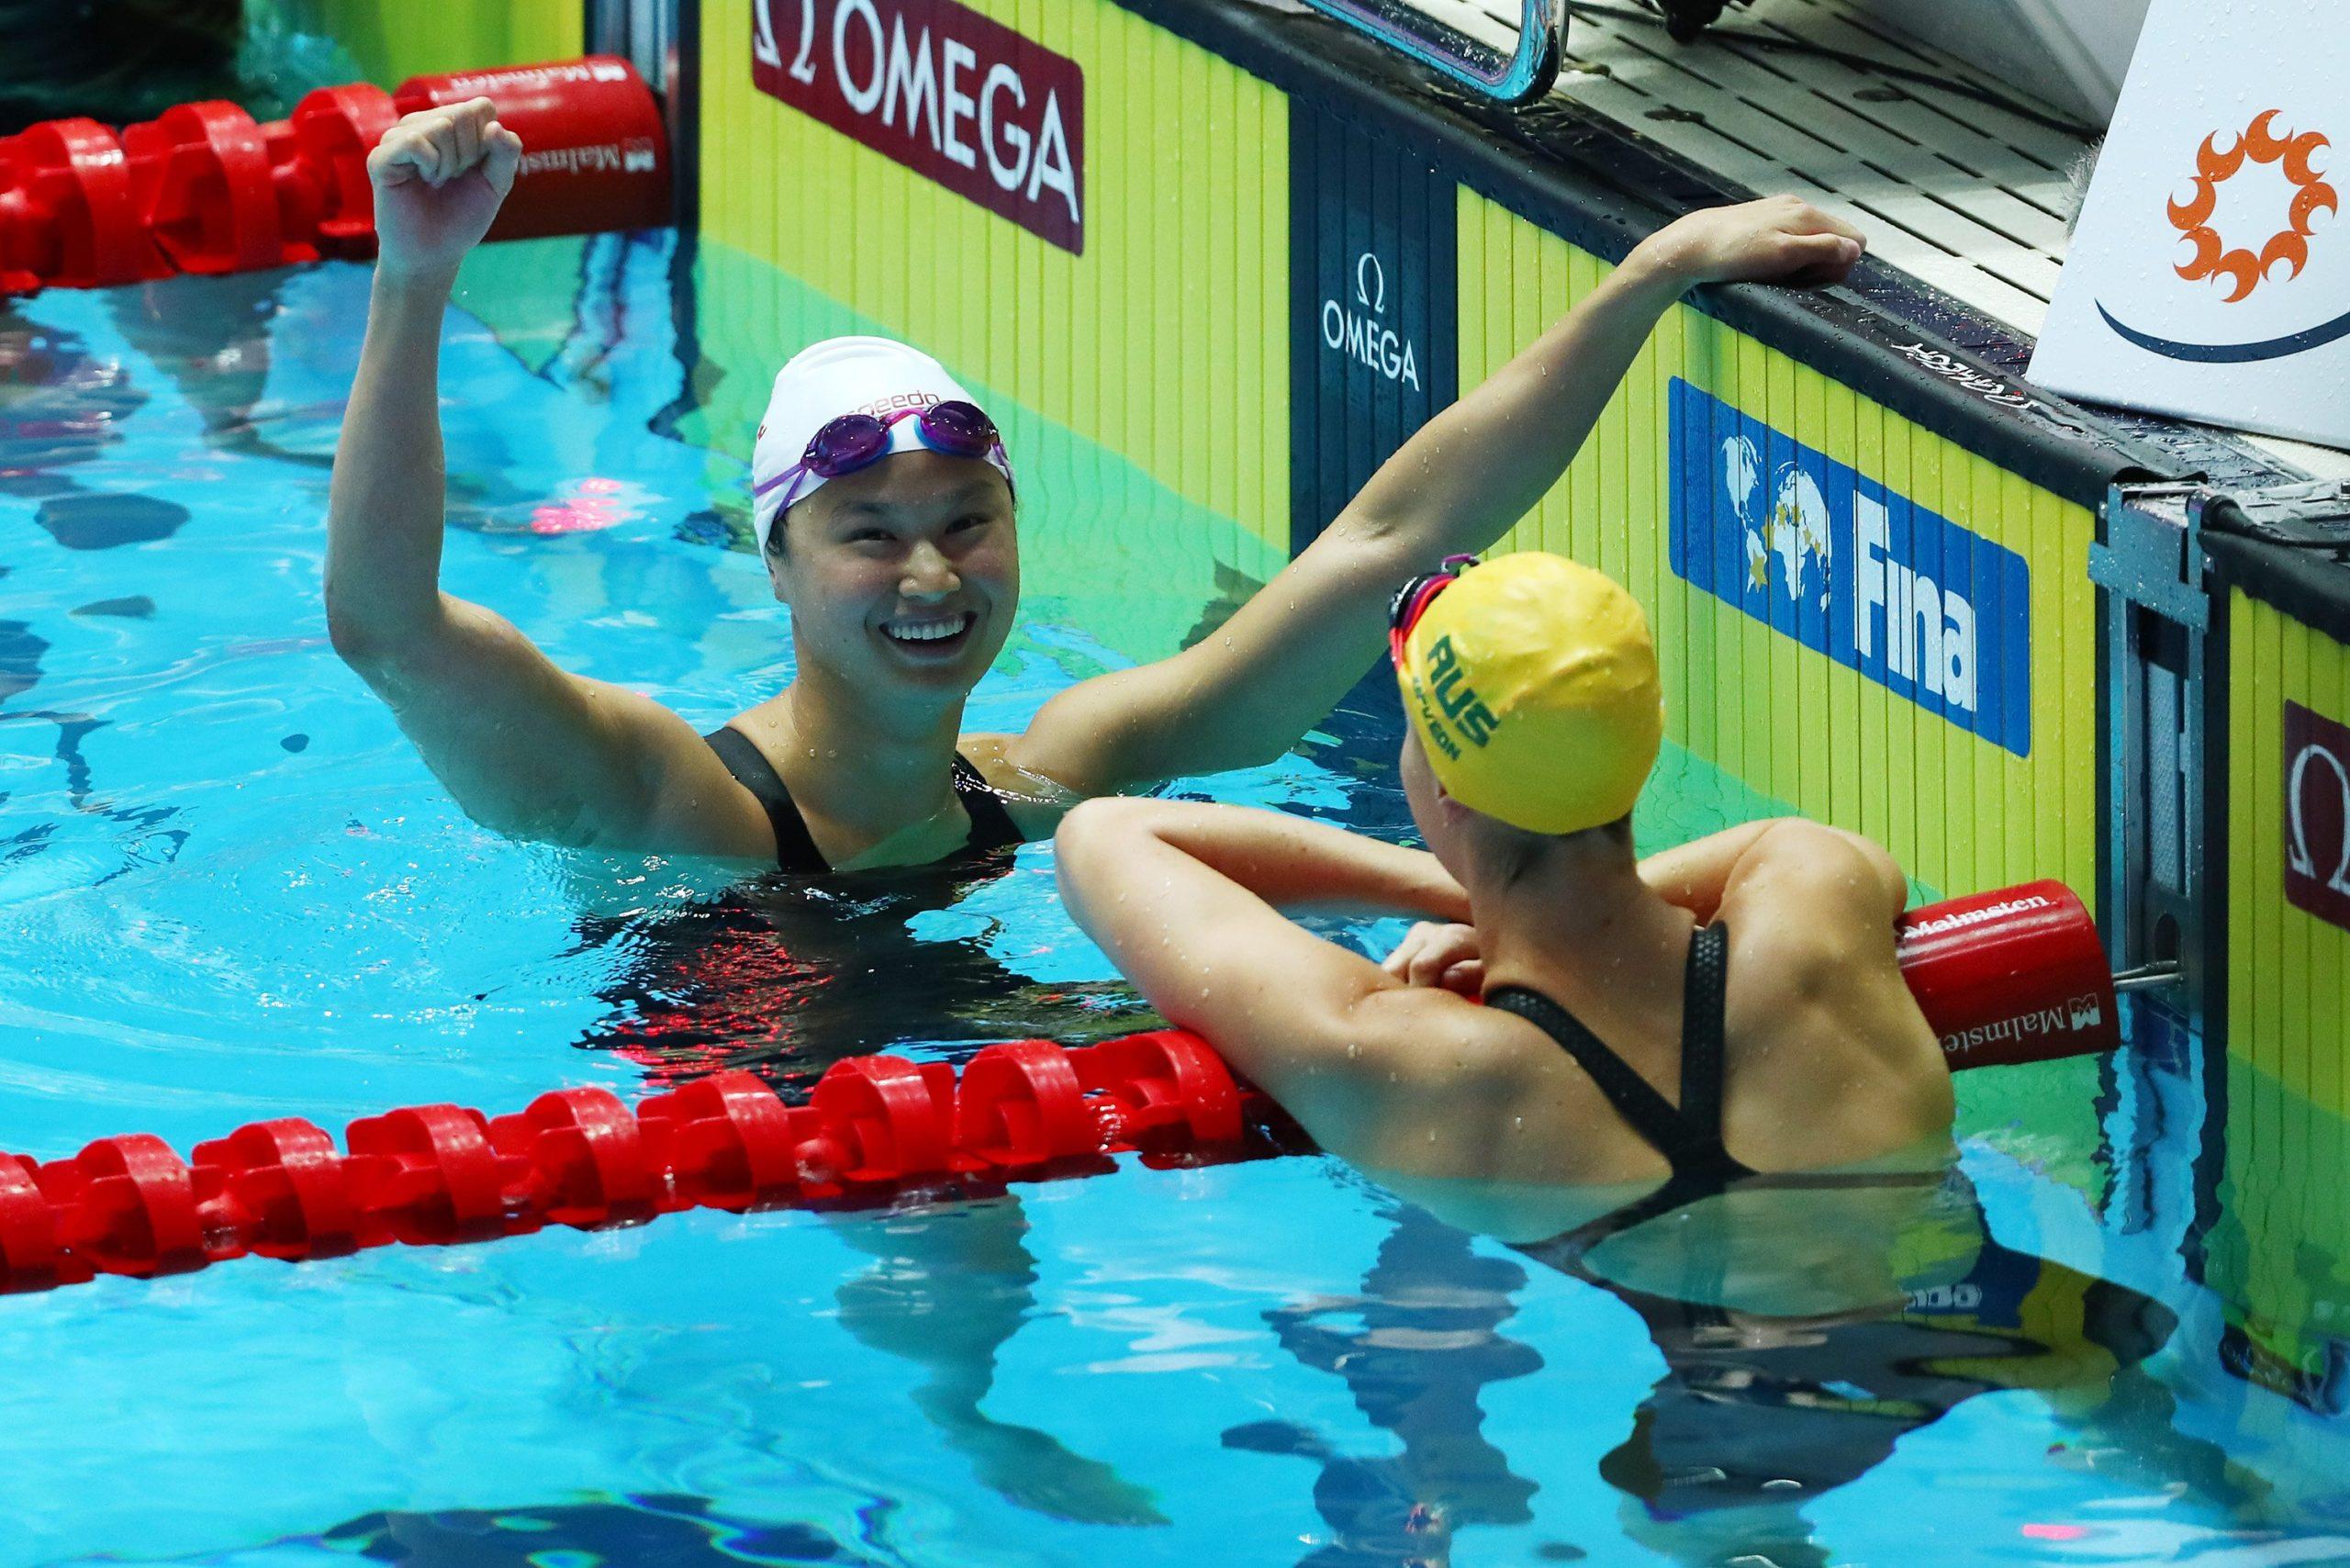 Coronavirus: London world champion swimmer reacts to Canada's withdrawal from Tokyo Olympics